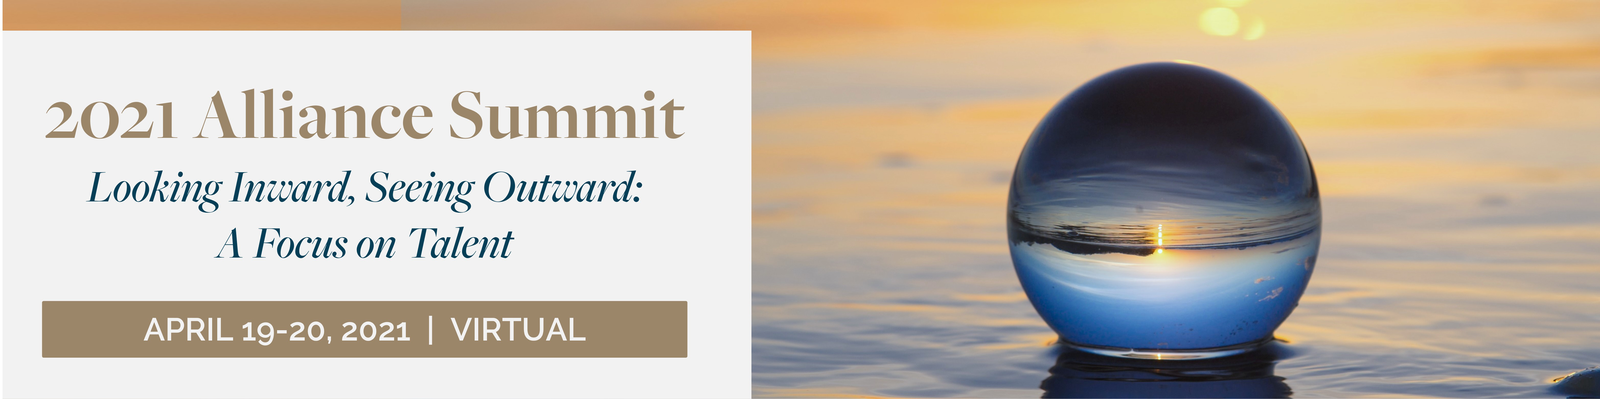 2021 Alliance Summit: April 19-20